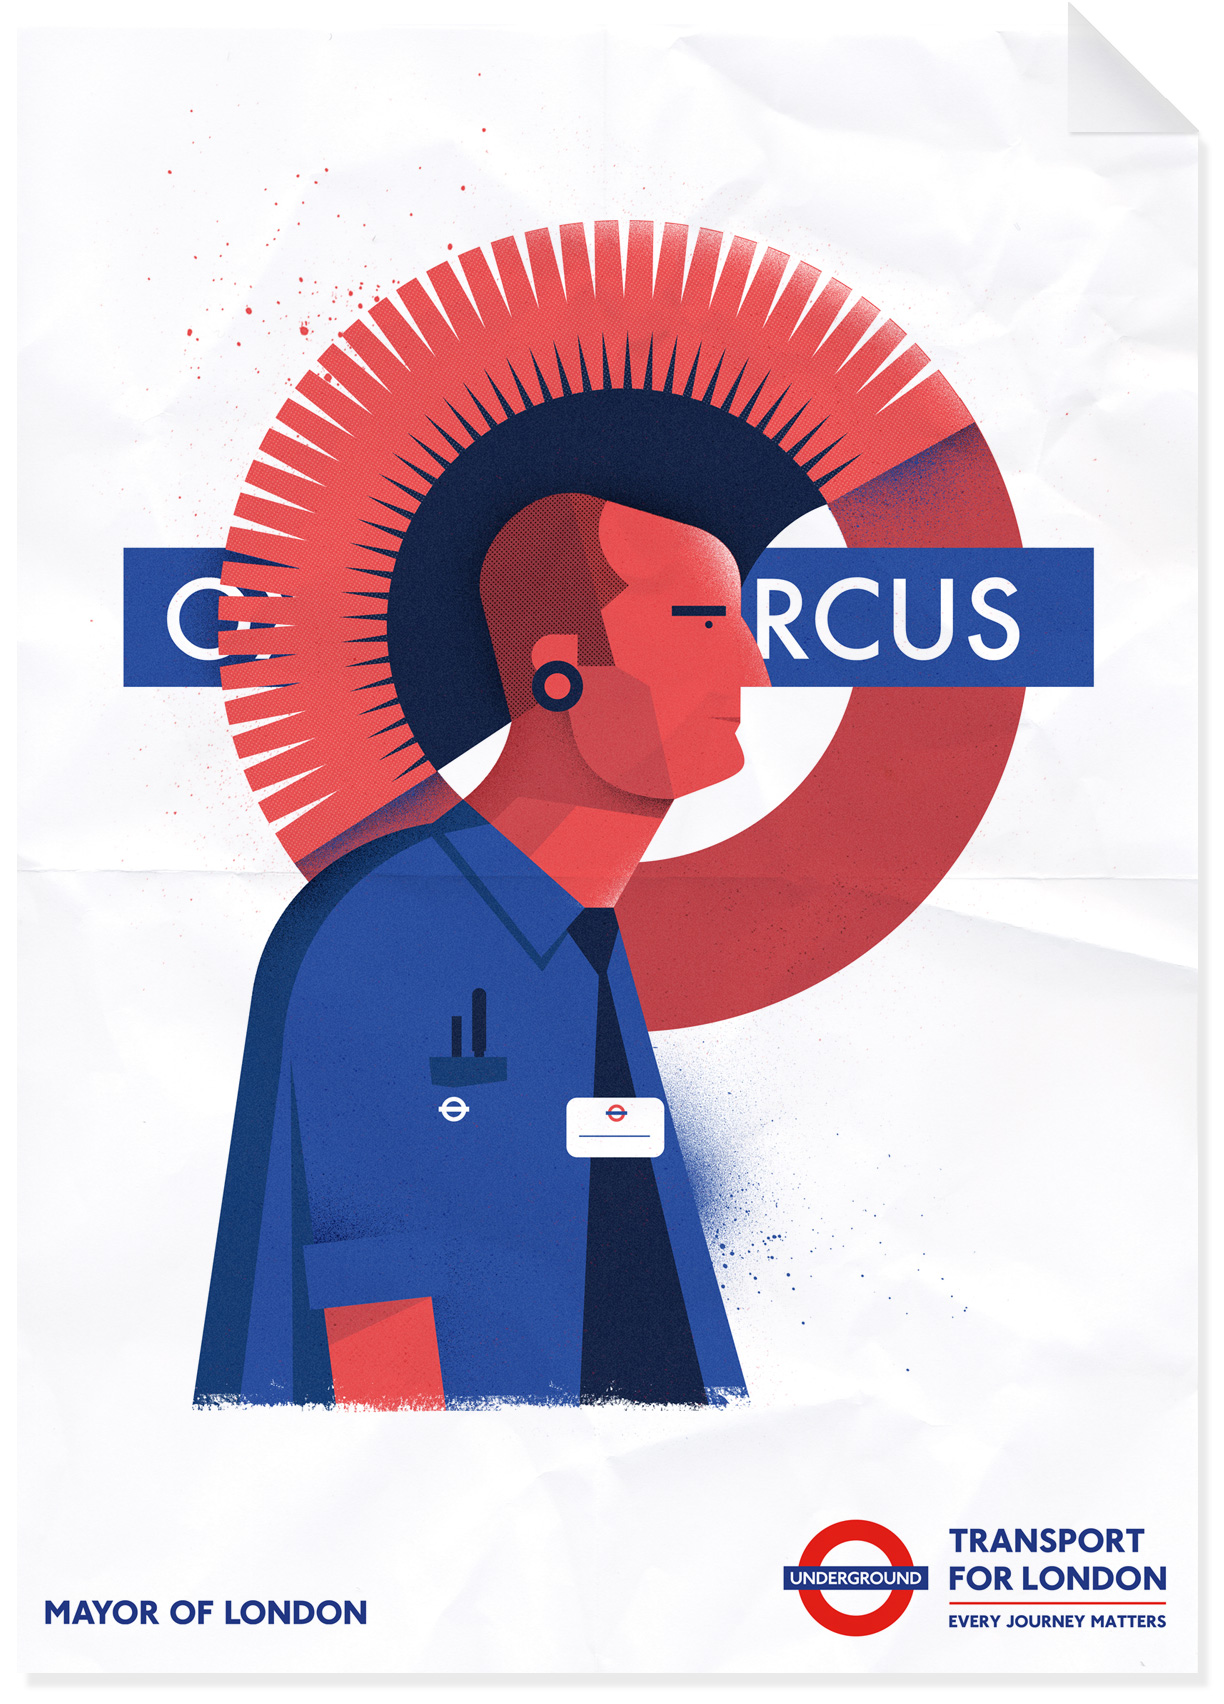 dale edwin murray freelance illustrator personal tfl london underground poster illustration